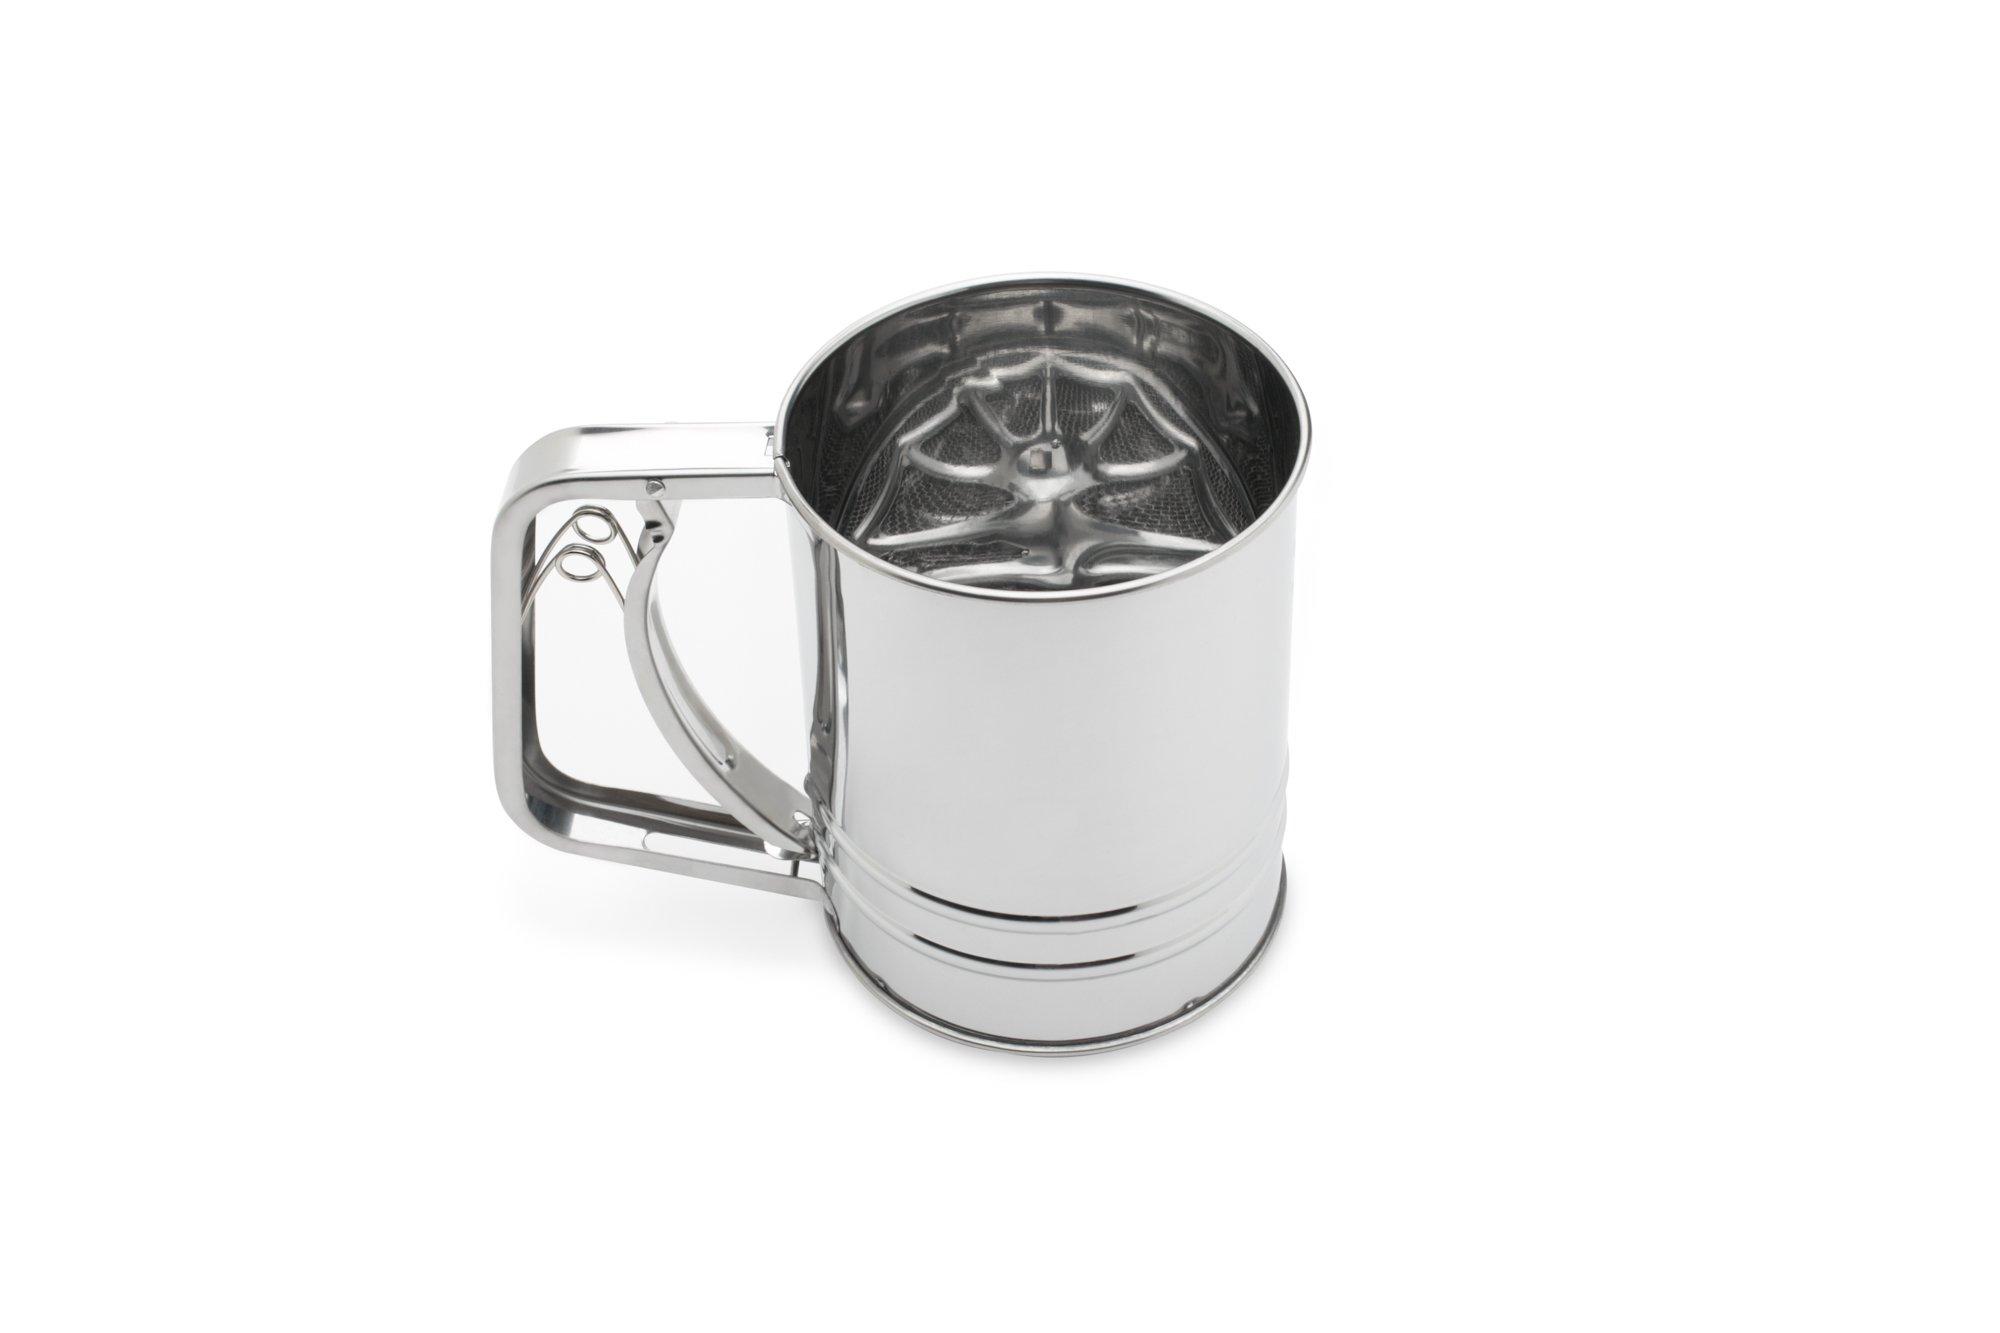 Fox Run 4653 Flour Sifter, Stainless Steel, 3-Cup by Fox Run